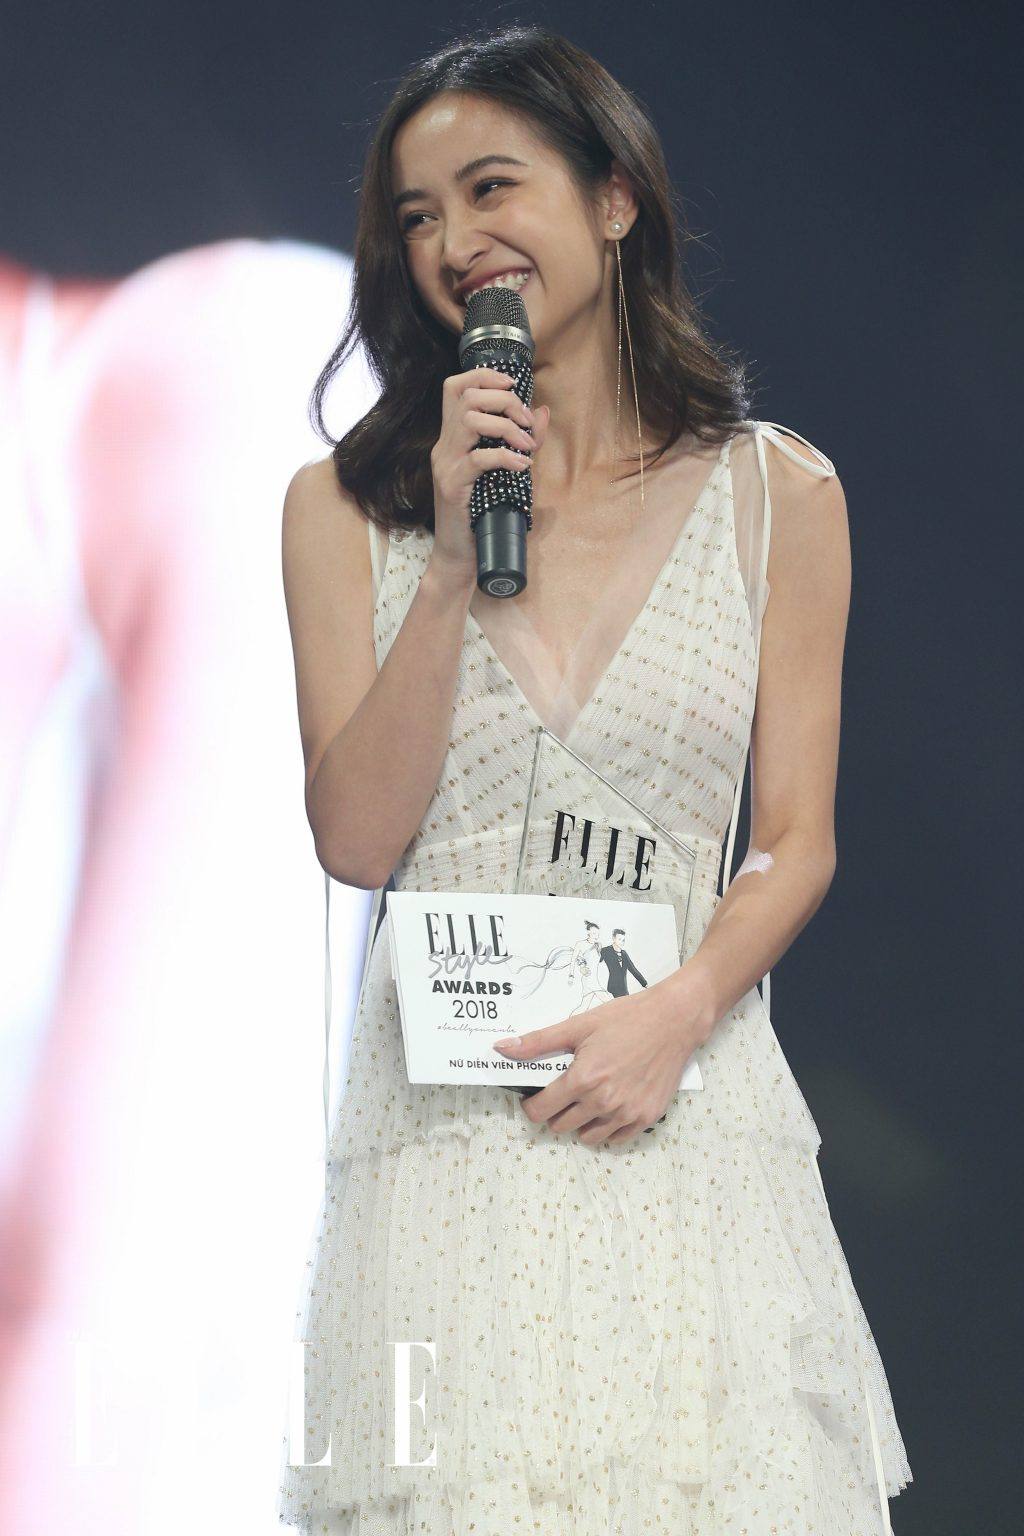 ELLE Style Awards 2018 jun vũ nhận giải